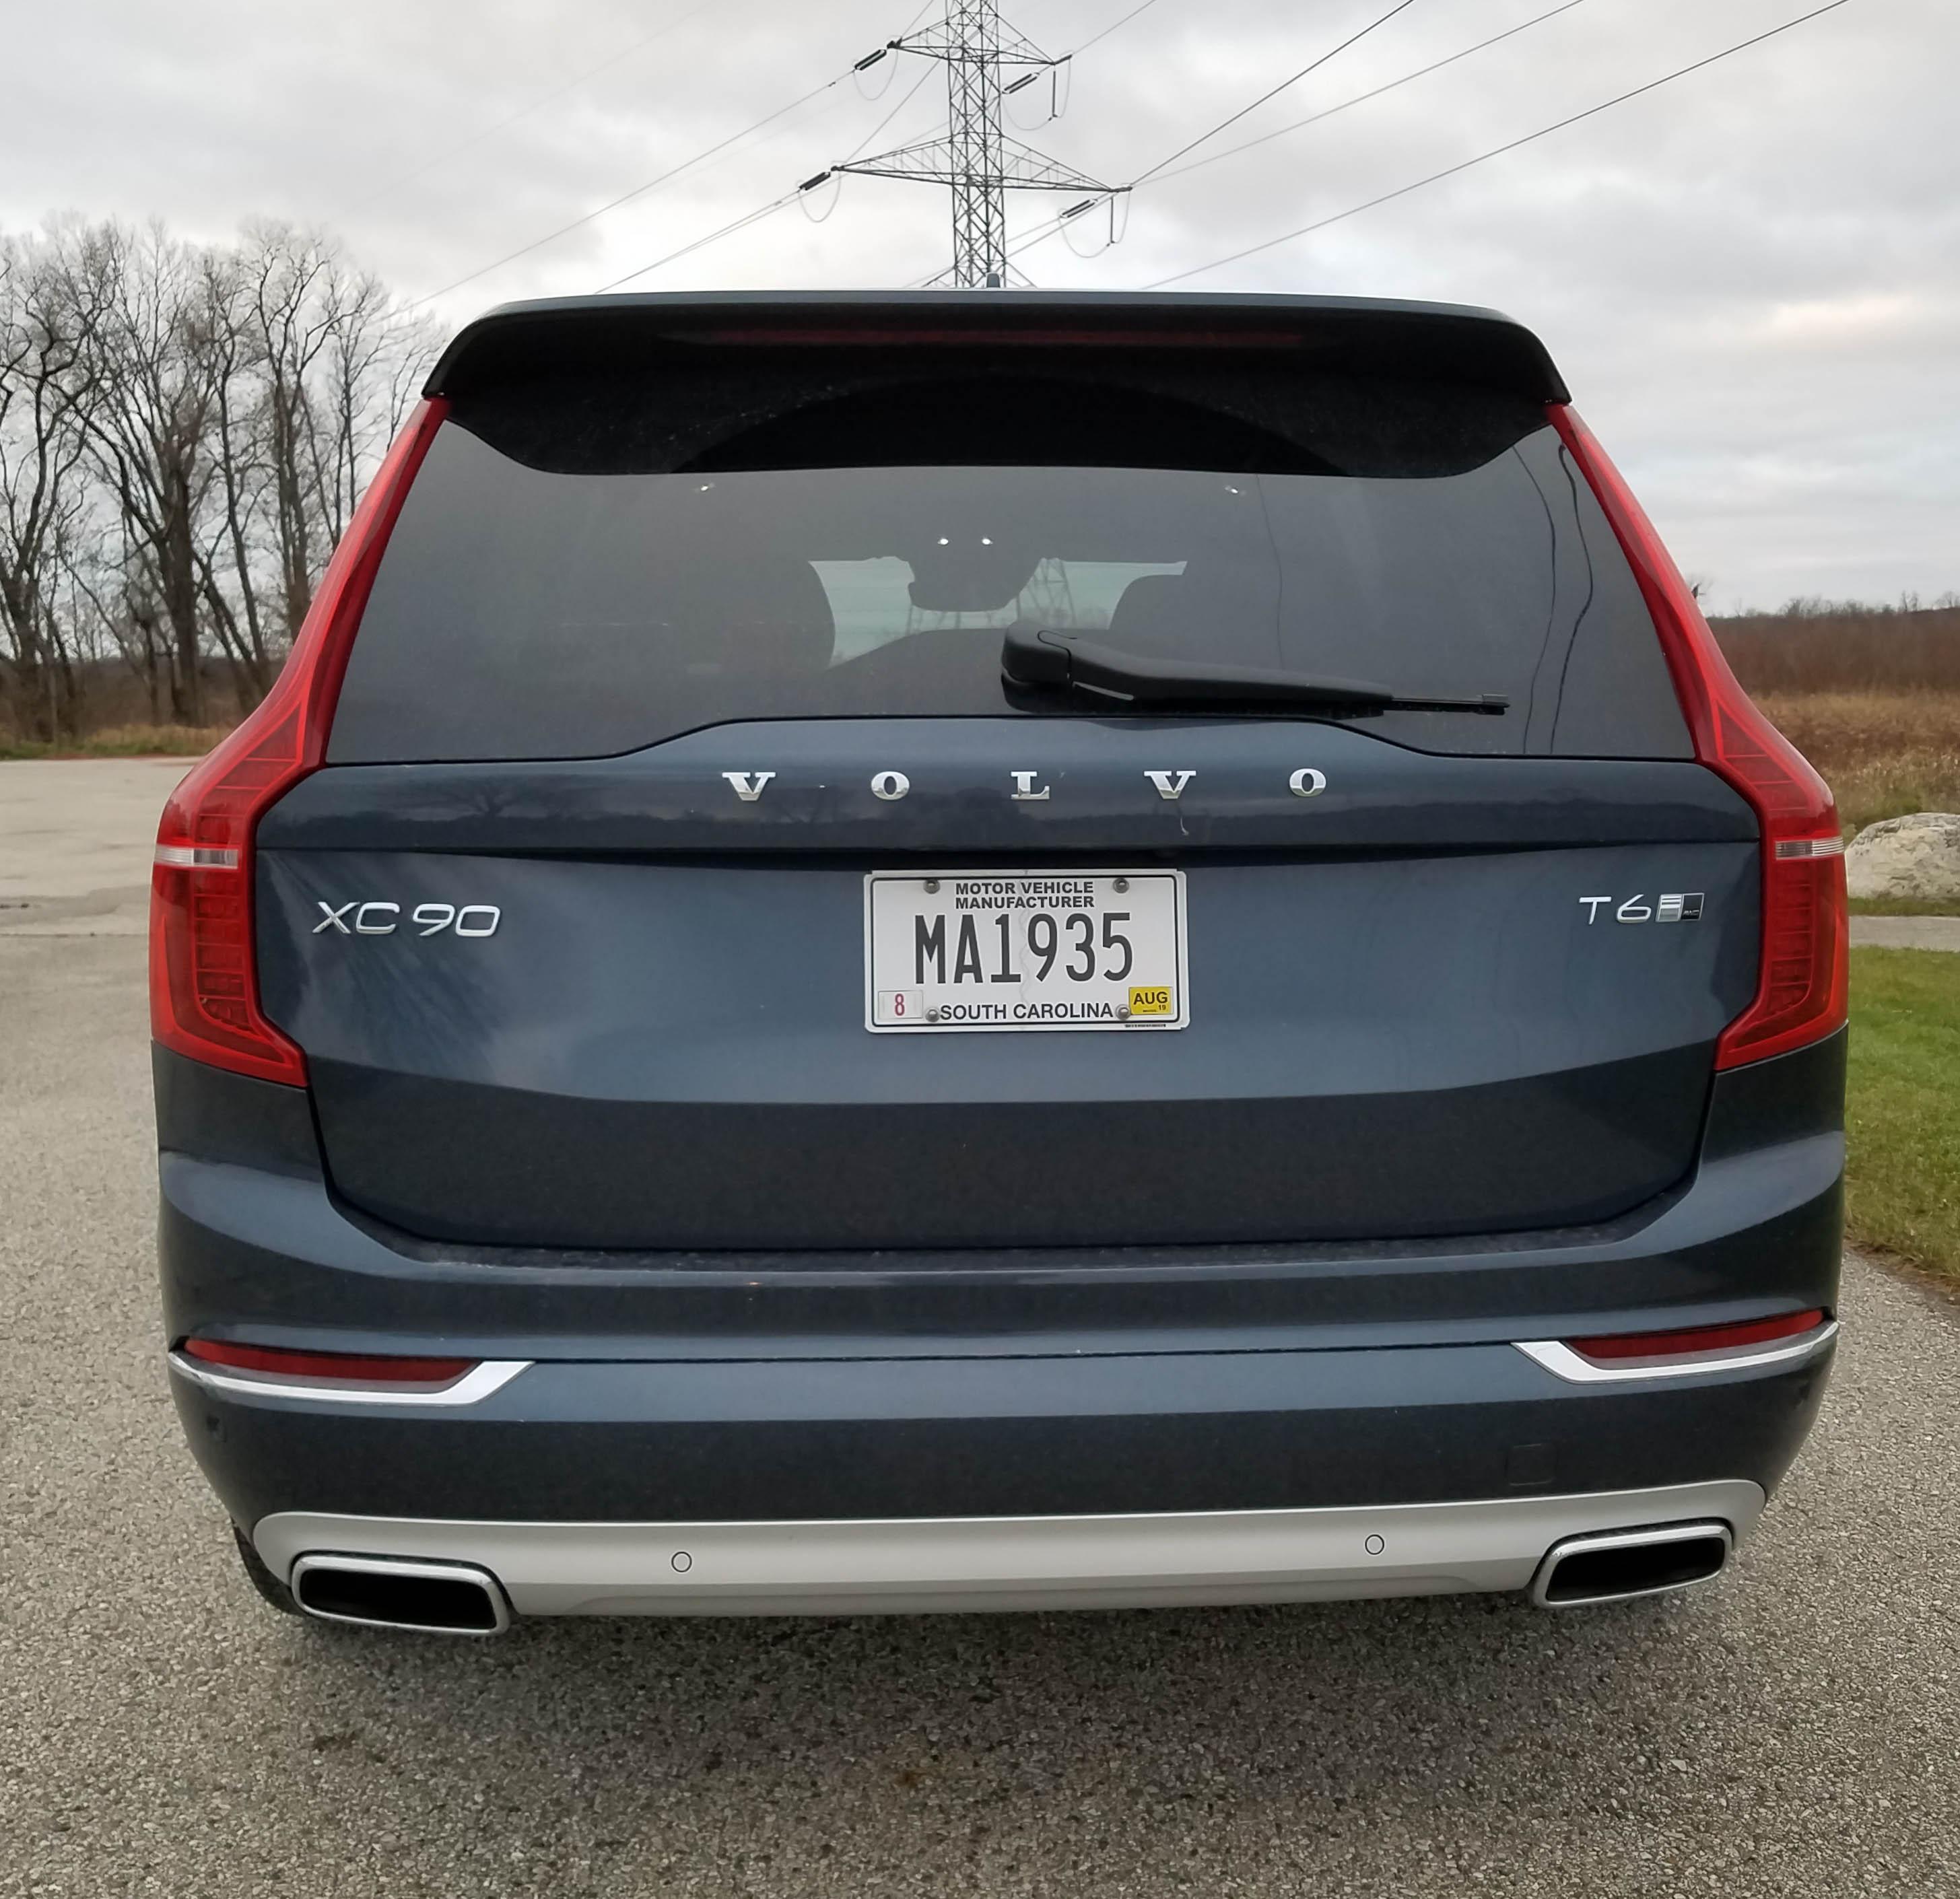 2019 Volvo Xc90 T5 R Design Price: 2019 Volvo XC90 T6 AWD Inscription